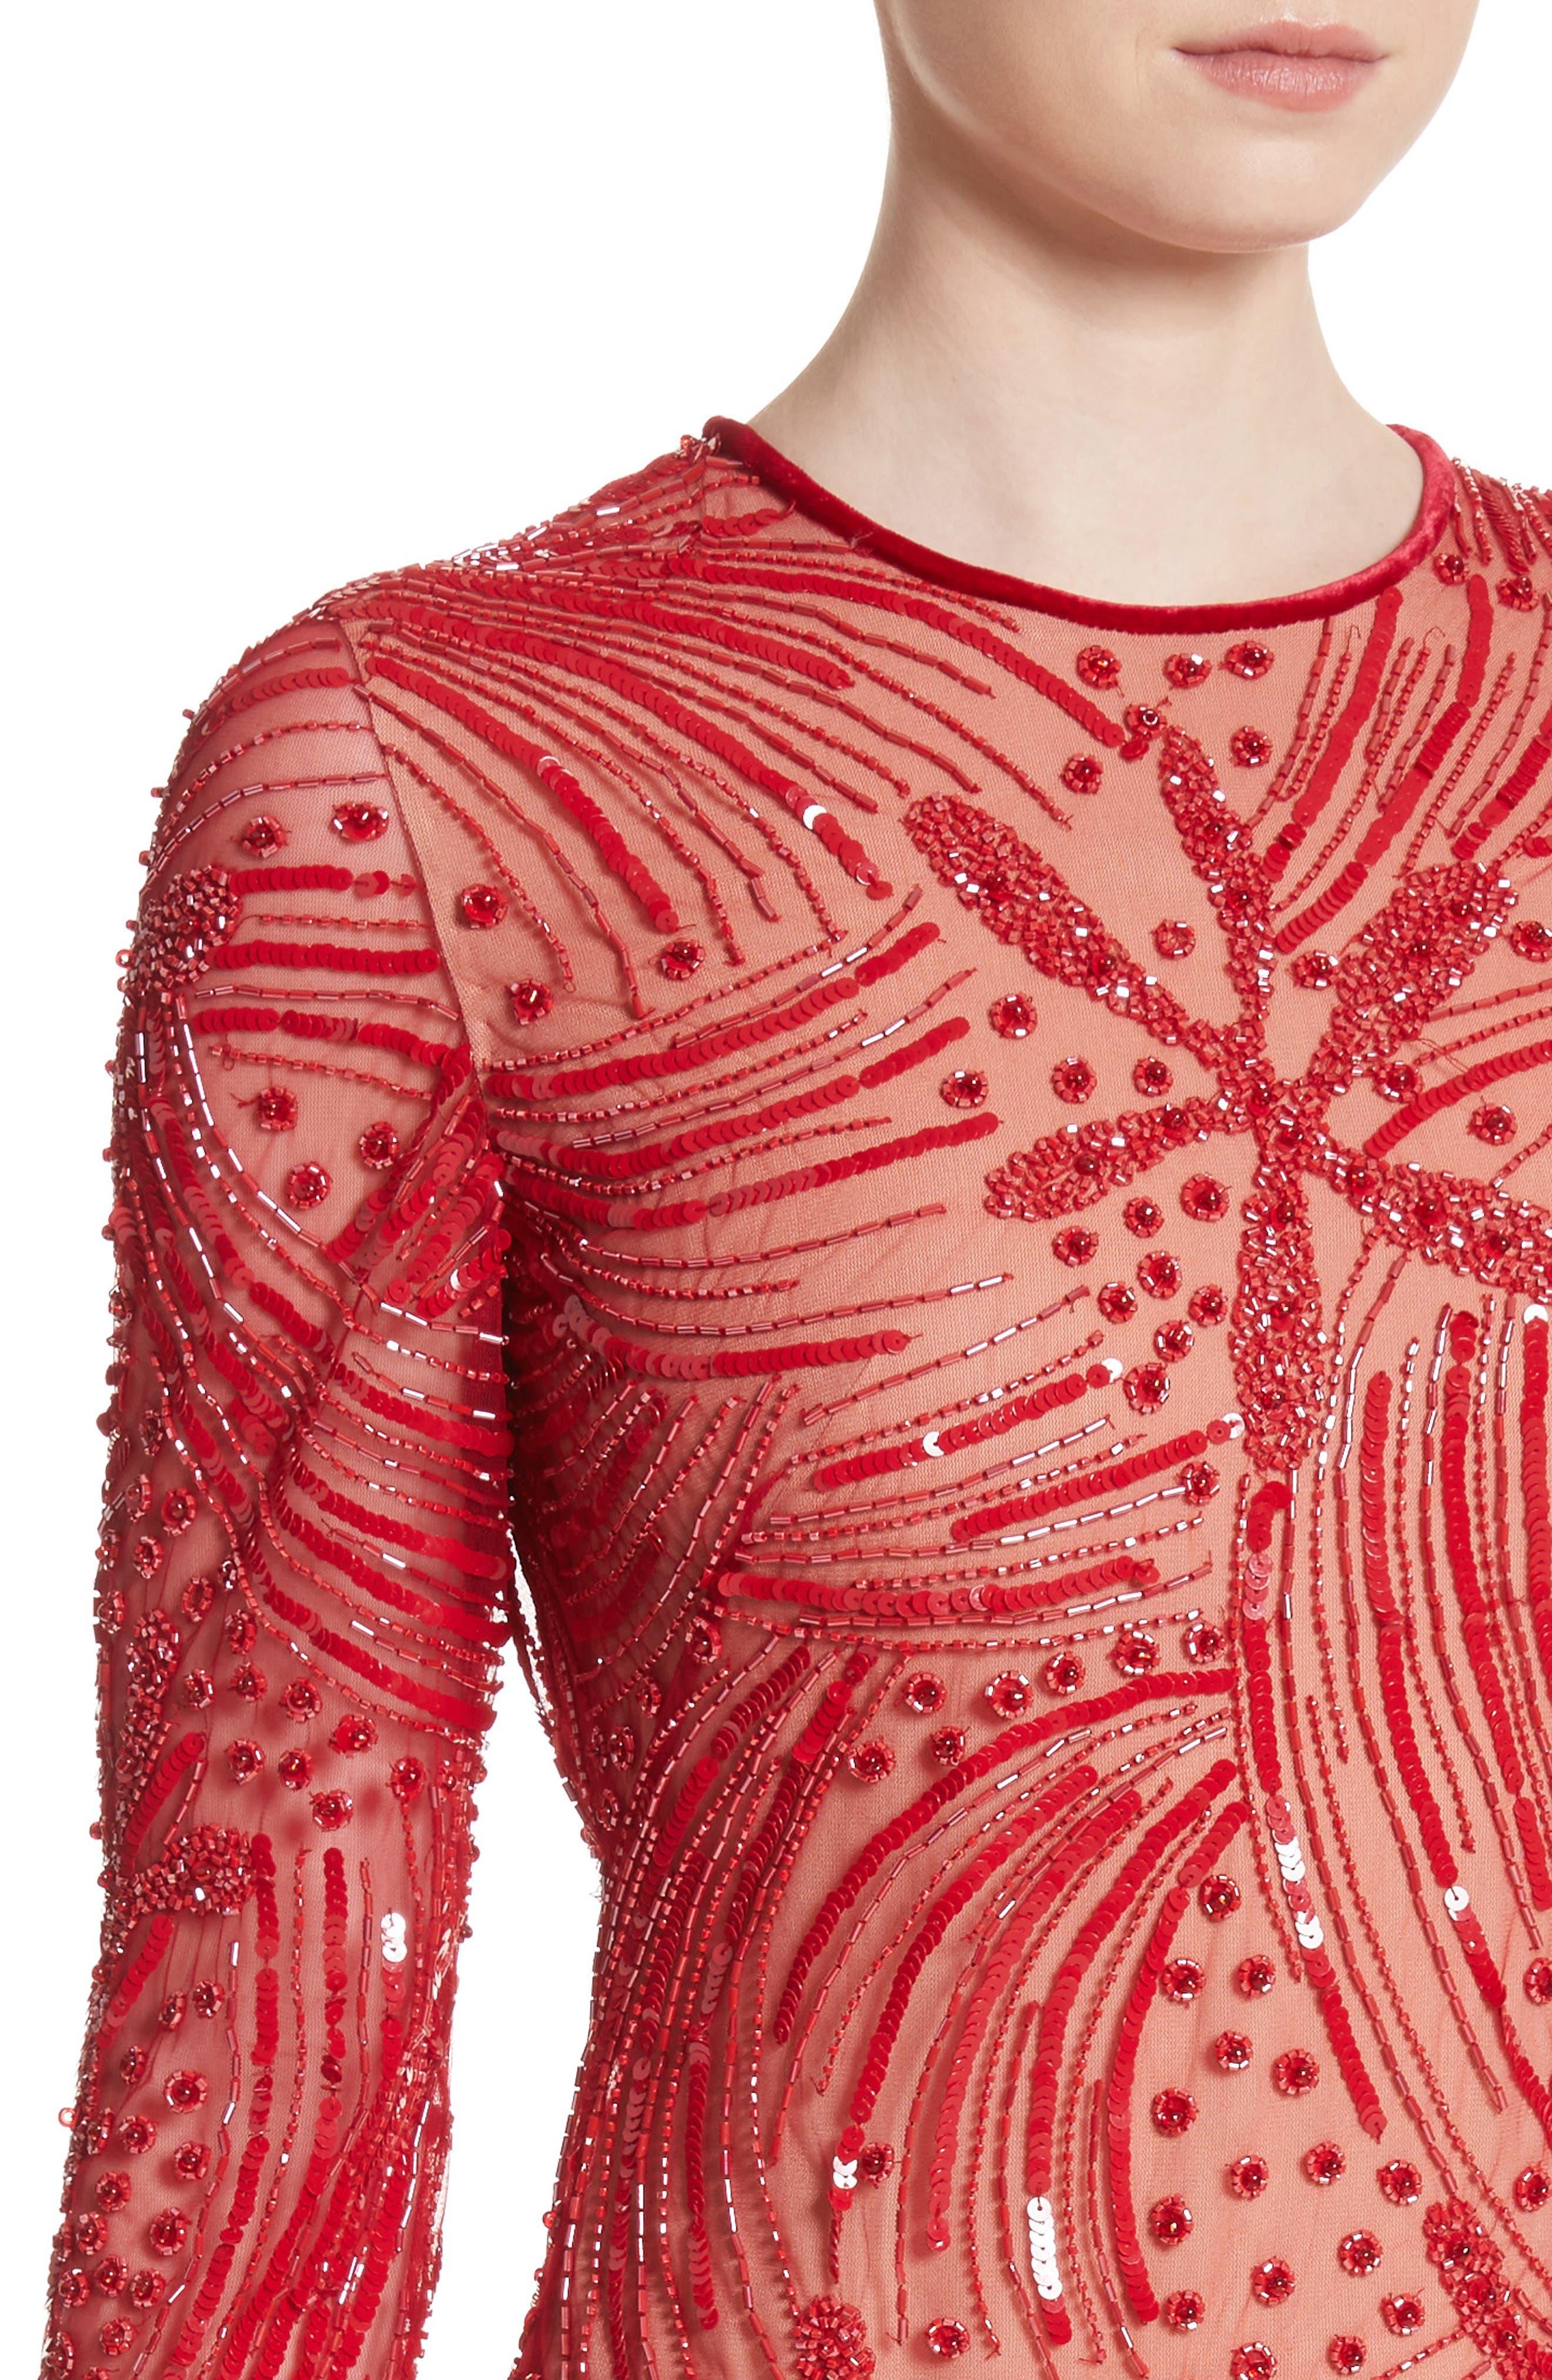 Beaded Sheath Dress,                             Alternate thumbnail 4, color,                             600